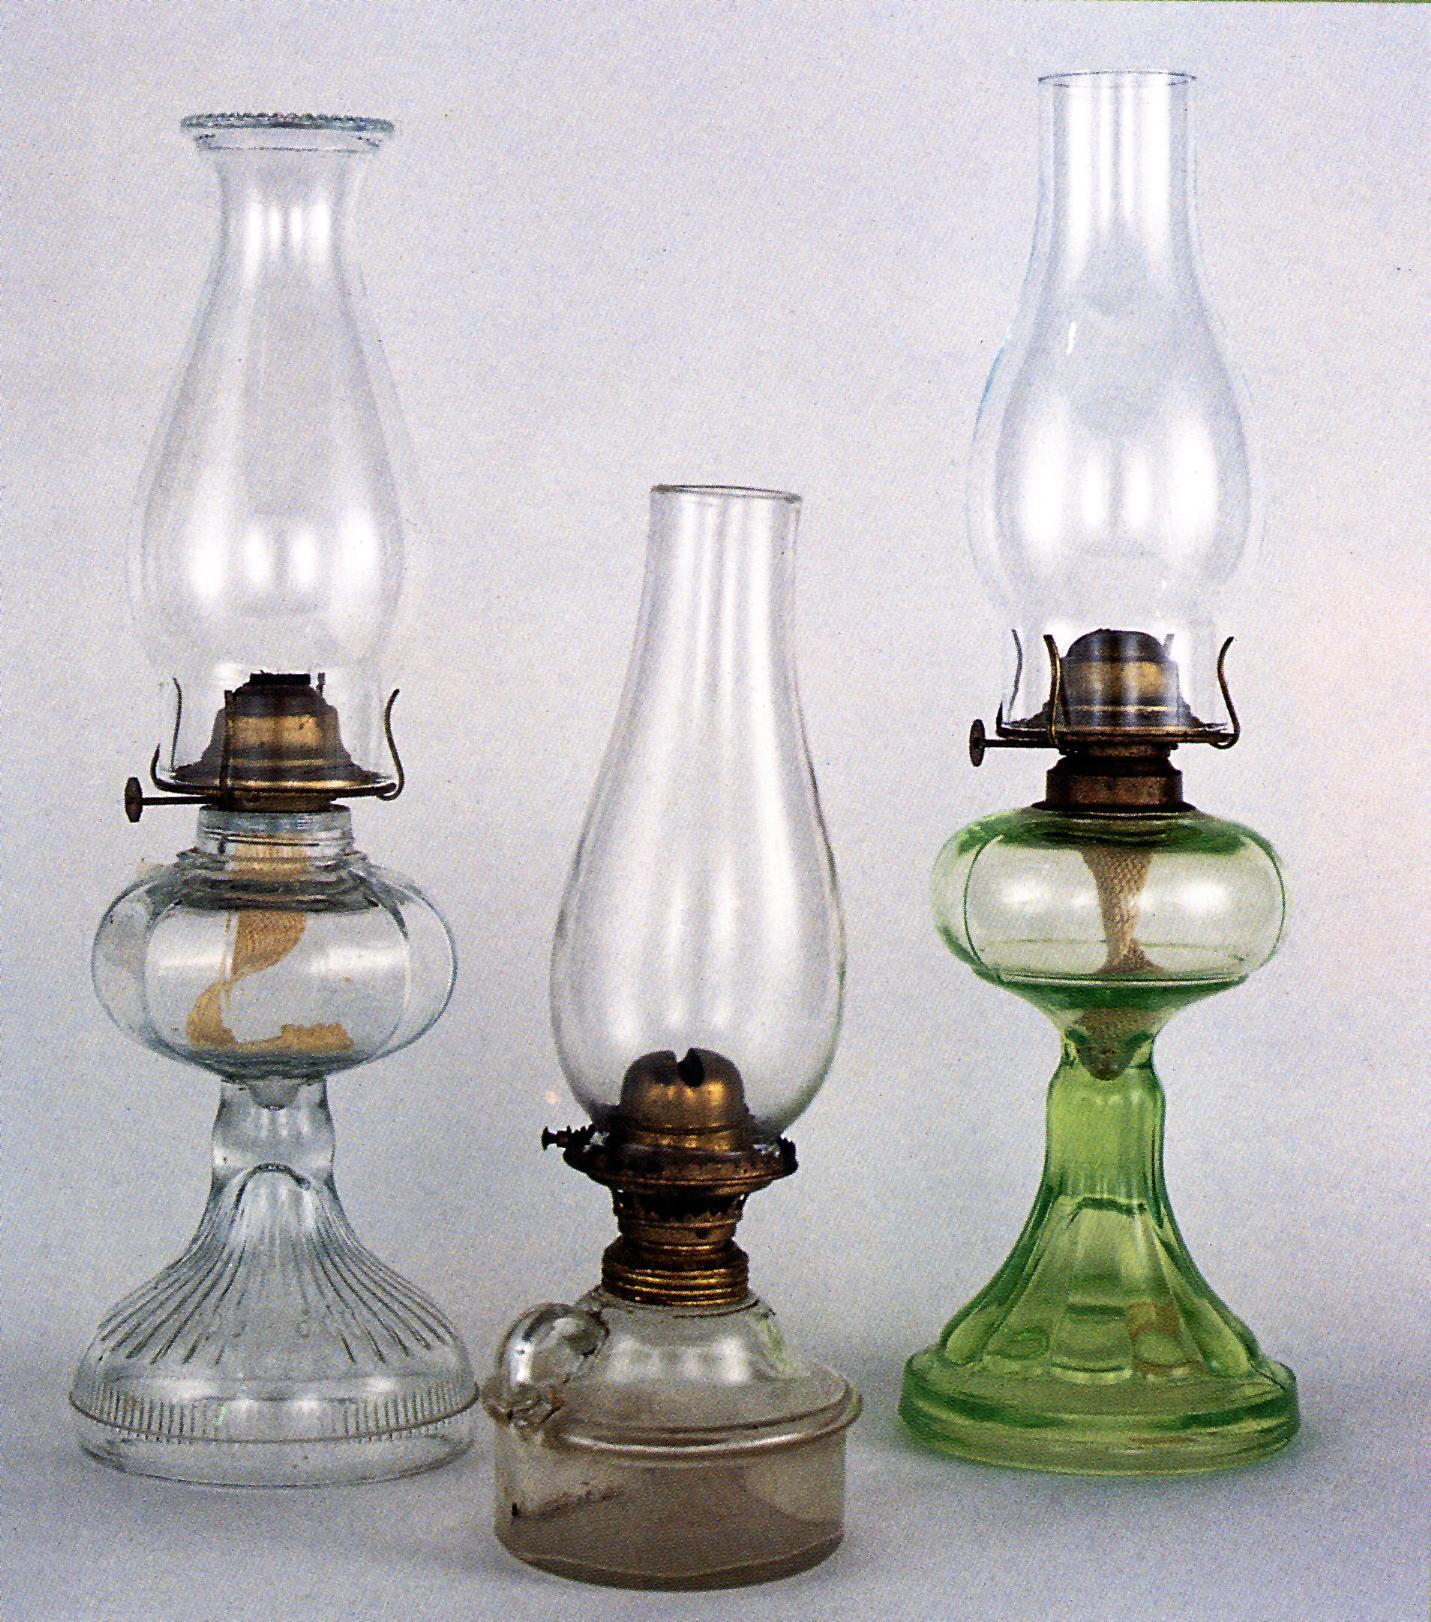 Antique kerosene lamps - 10 fine sources of light as an ...